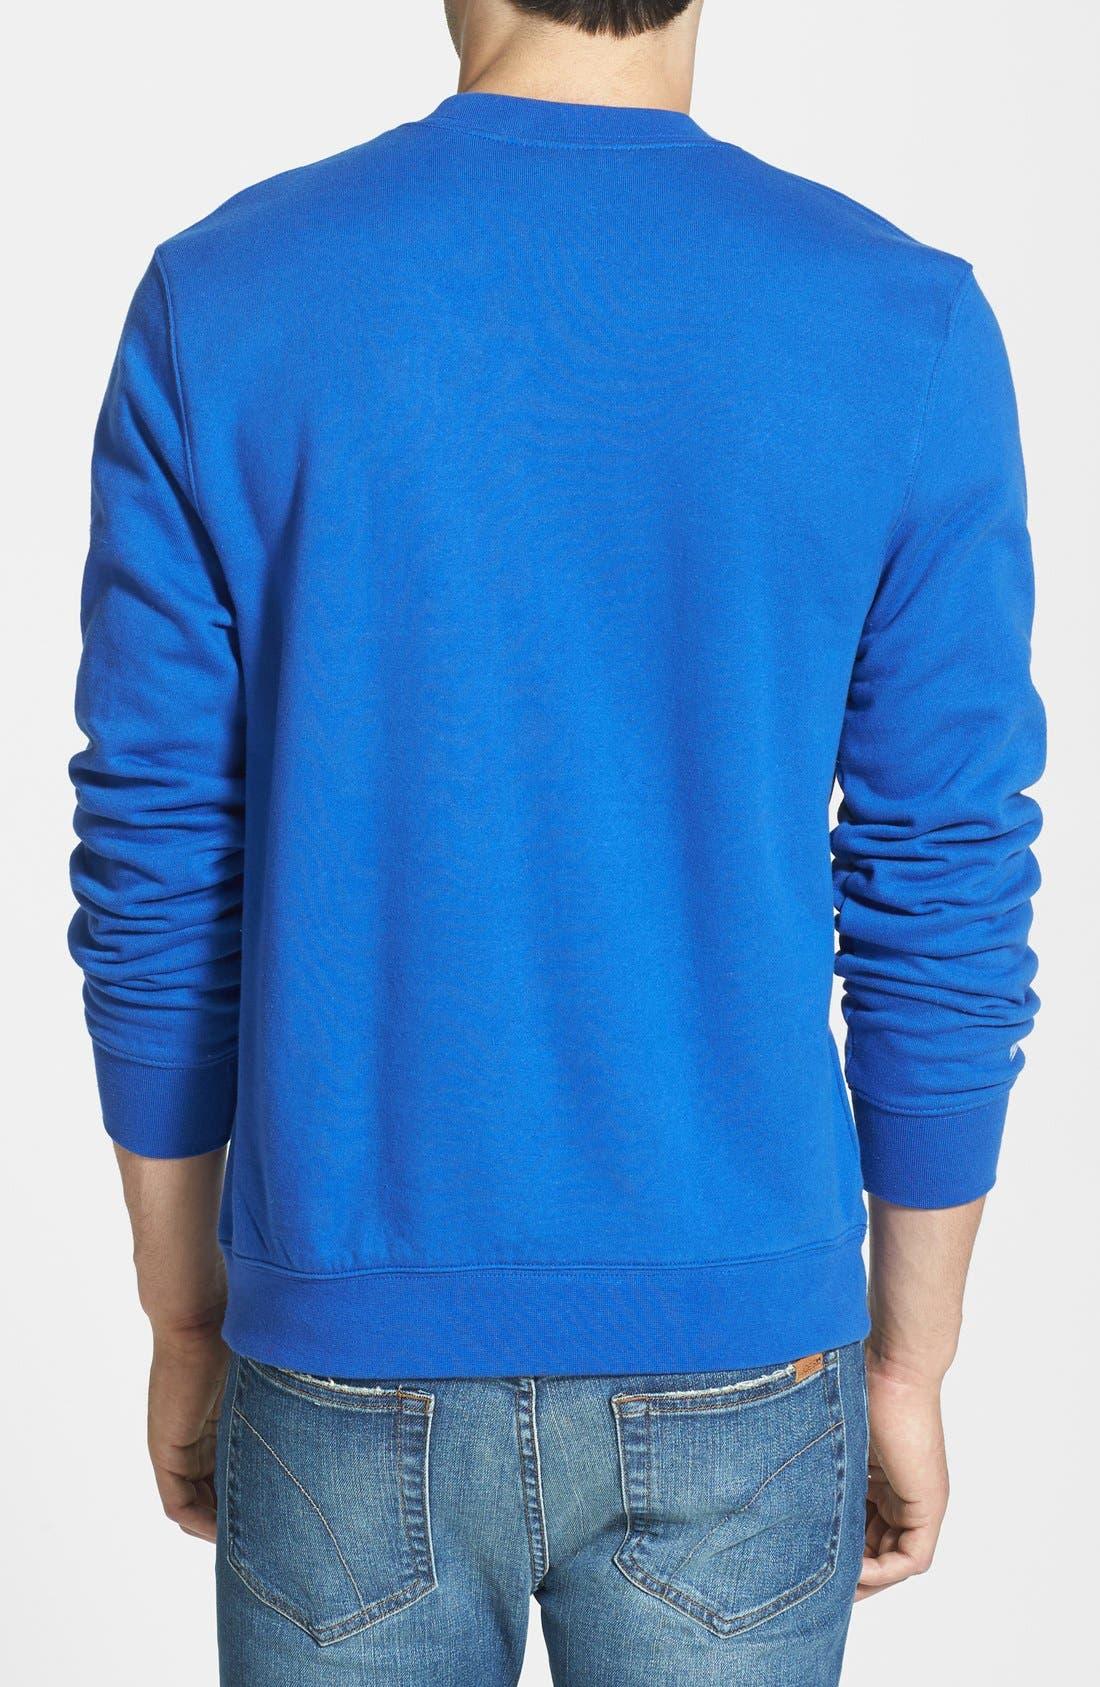 Alternate Image 2  - Mitchell & Ness 'Chicago Cubs' Crewneck Sweatshirt